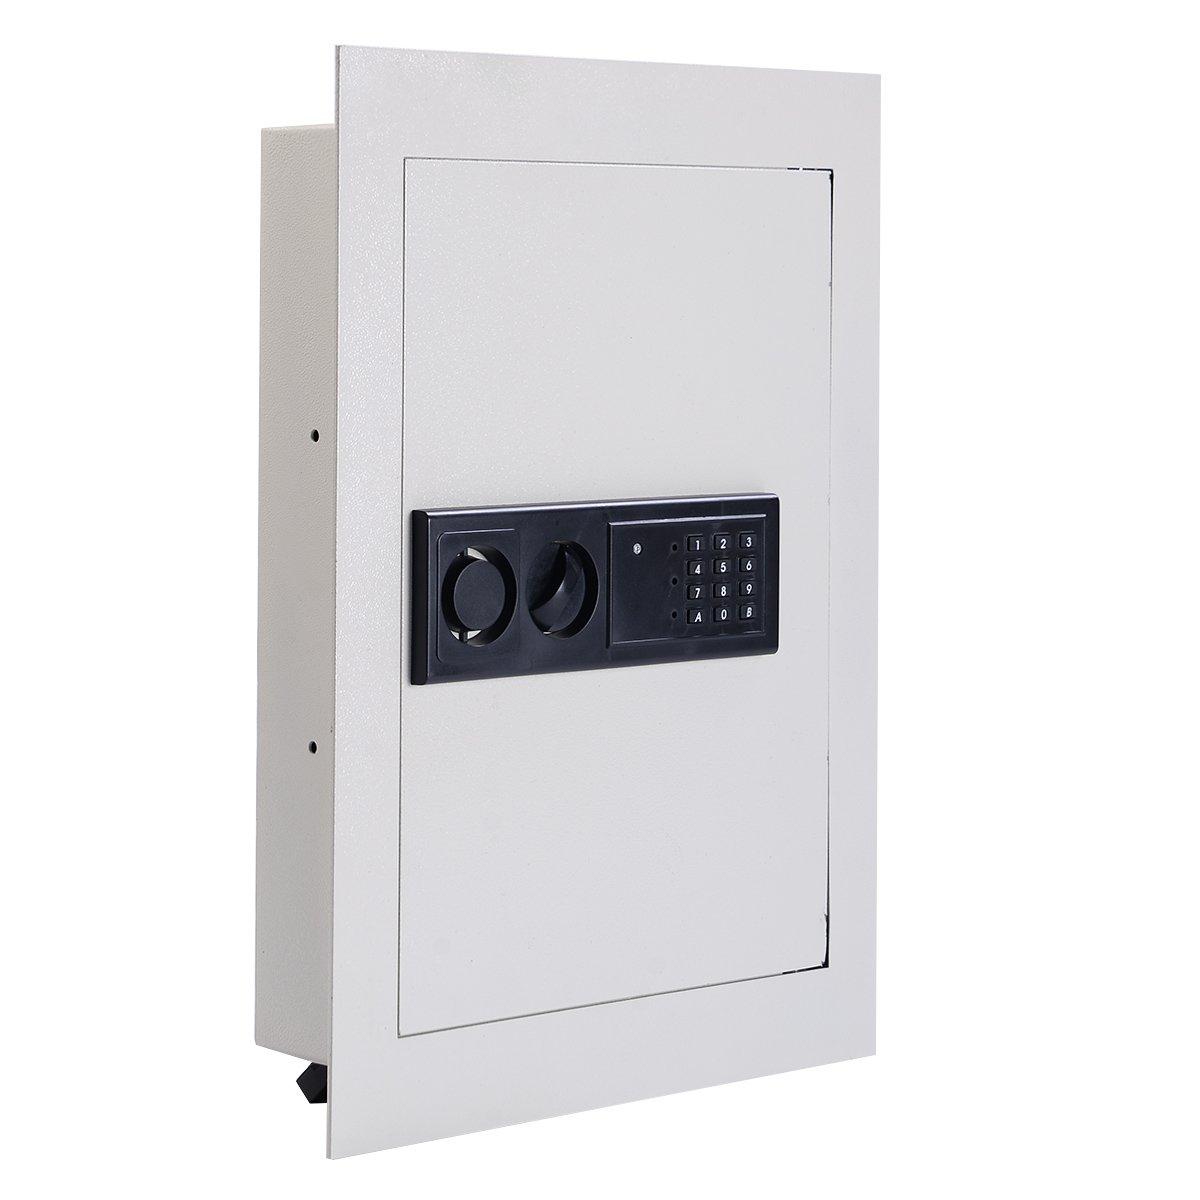 Giantex Electronic Hidden Security Cabinet